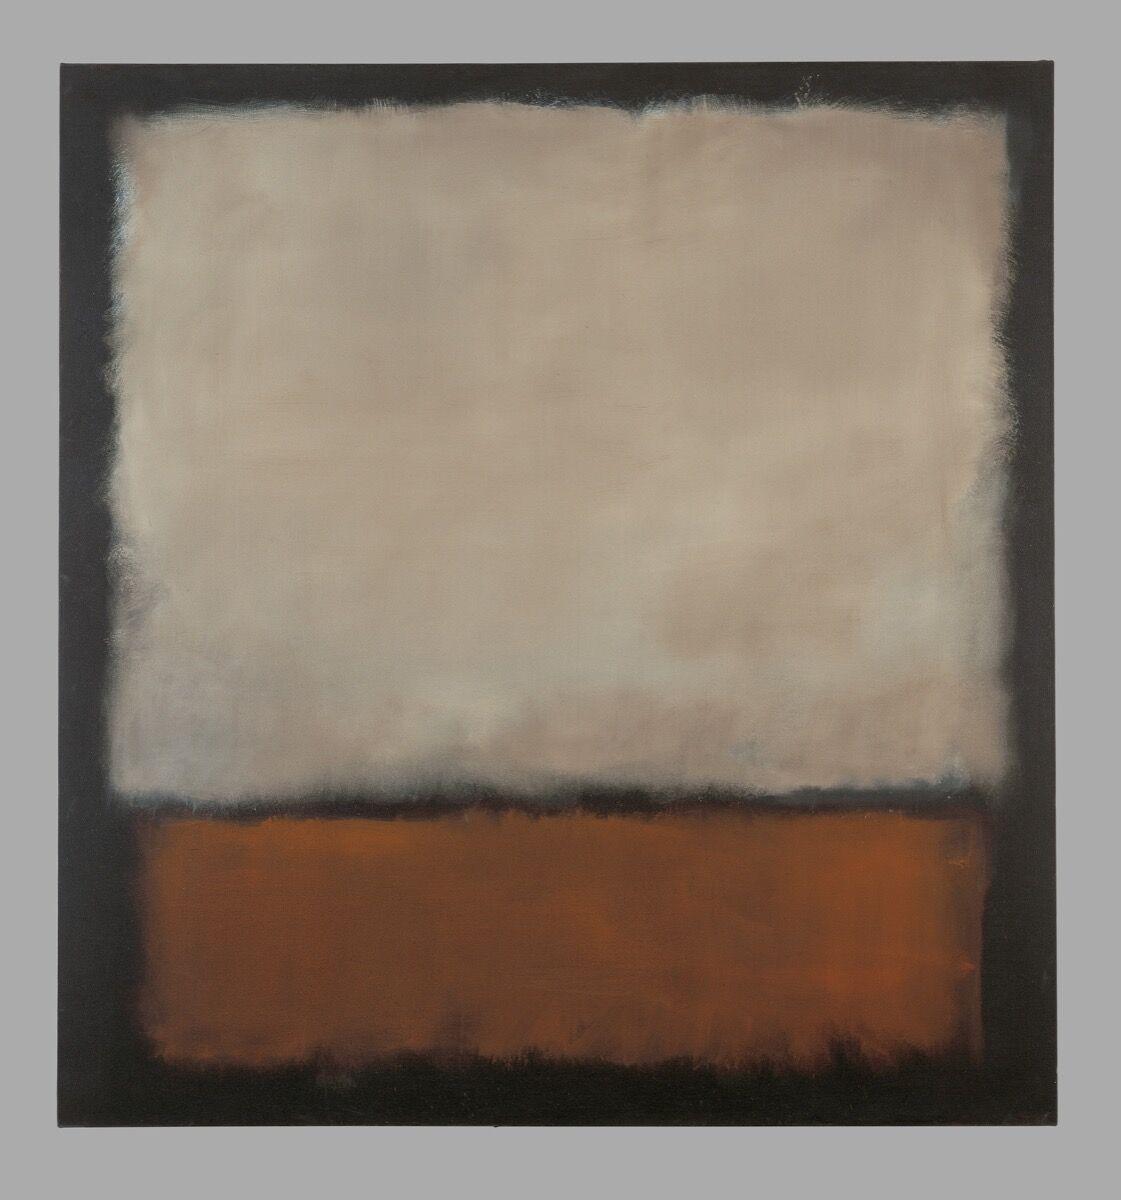 Mark Rothko, No. 7 (Dark Brown, Gray, Orange), 1963. © 1998 Kate Rothko Prizel & Christopher Rothko / Bildrecht, Vienna, 2019. Photo © Kunstmuseum Bern.